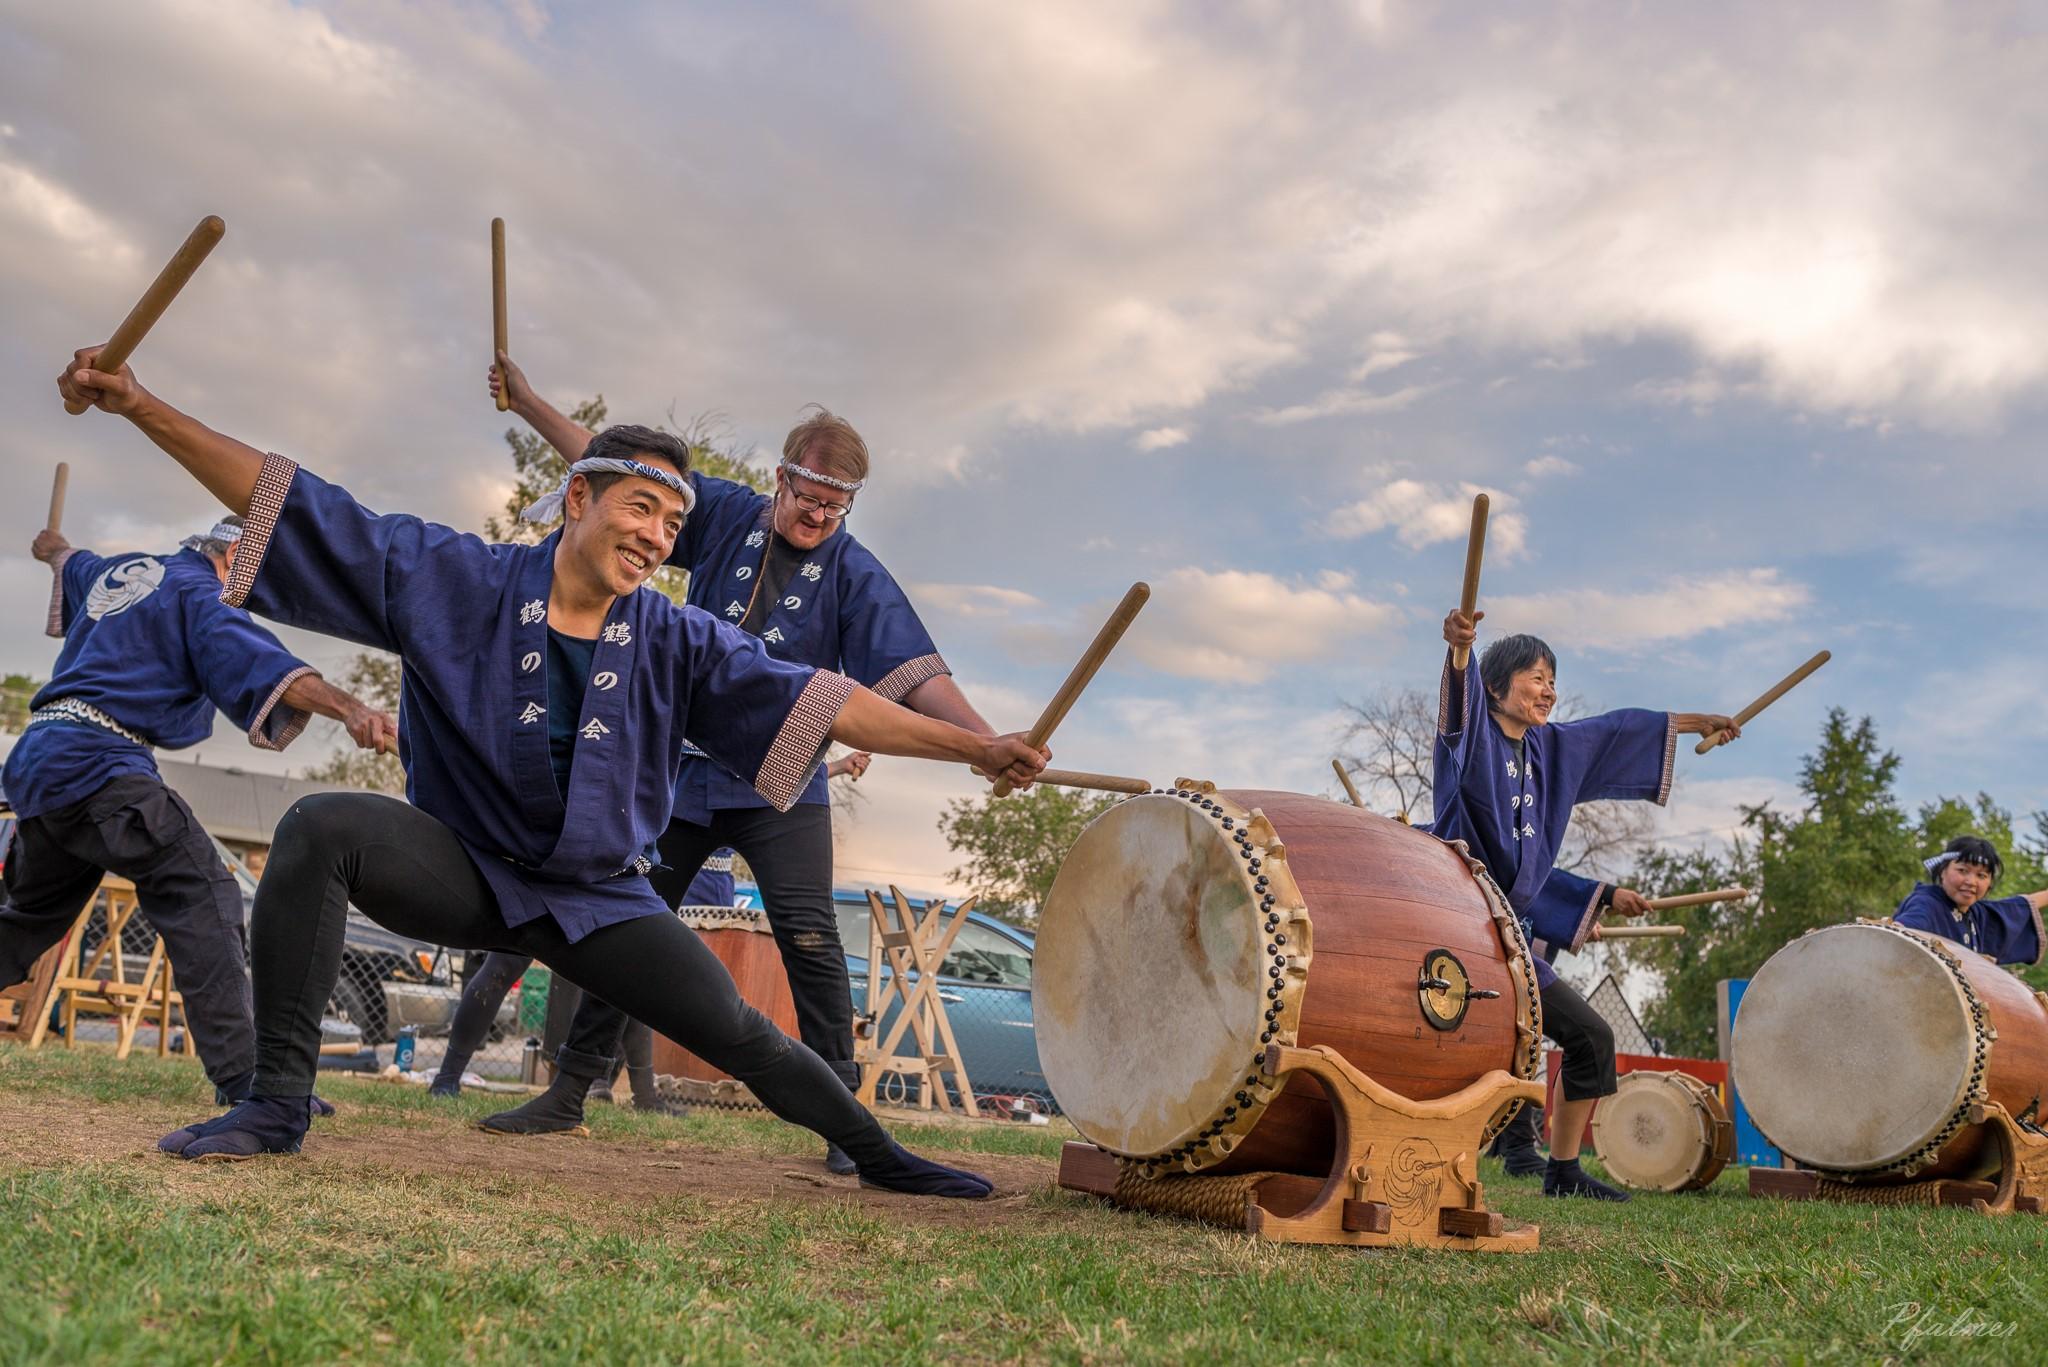 Pioneer Center Youth Programs presents Tsurunokai